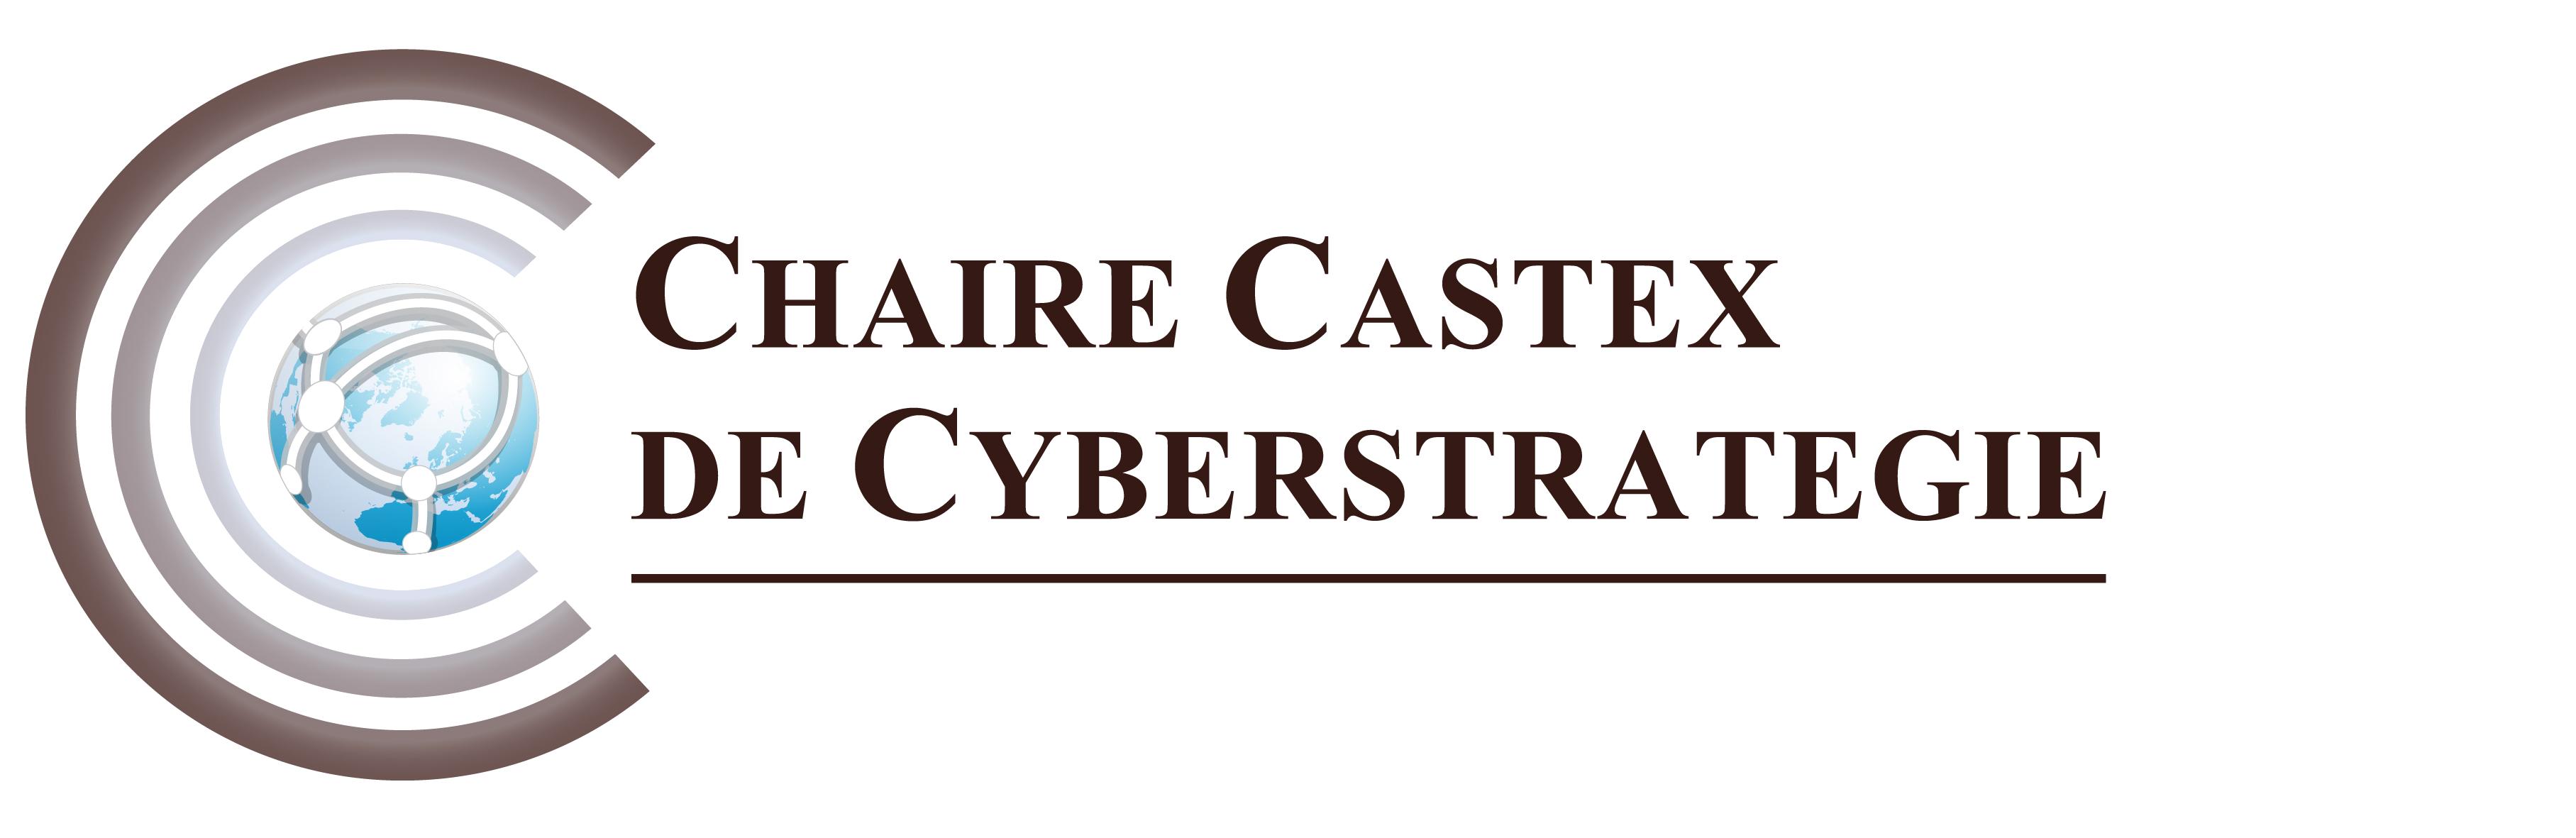 logo_ChaireCastexCyberstrategie